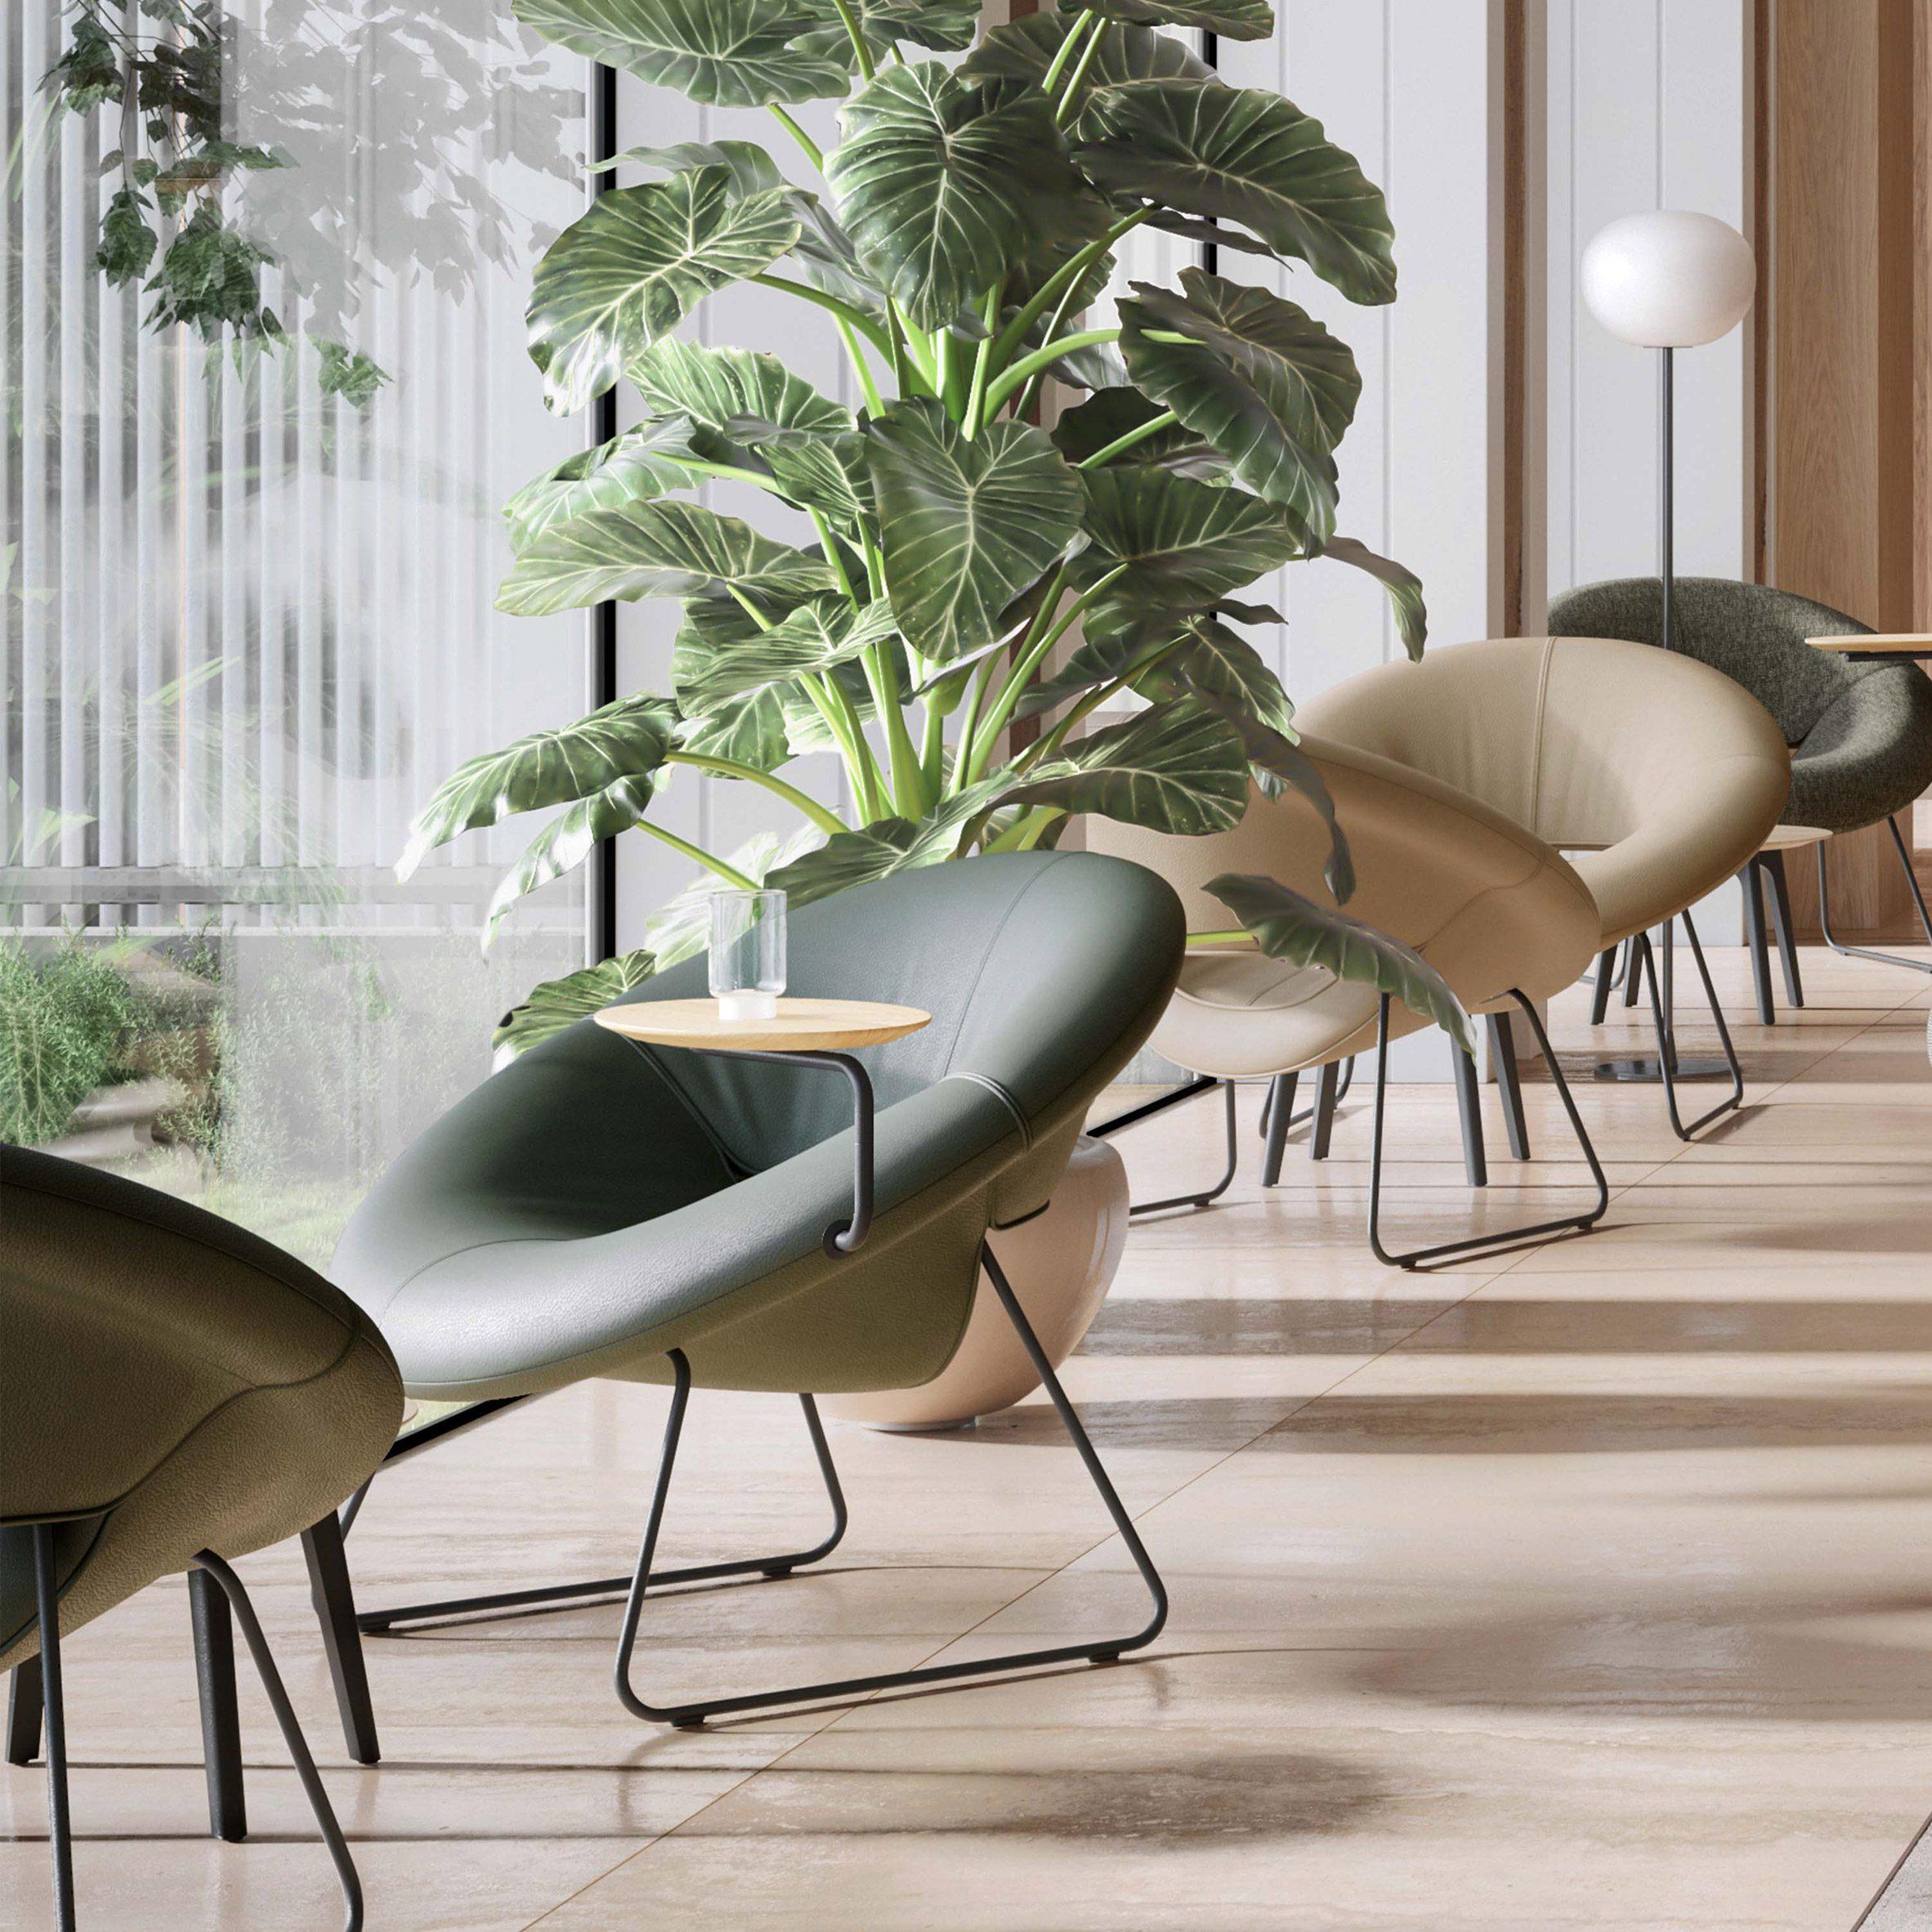 LXR18 armchair by Martin Ballendat for Leolux LX